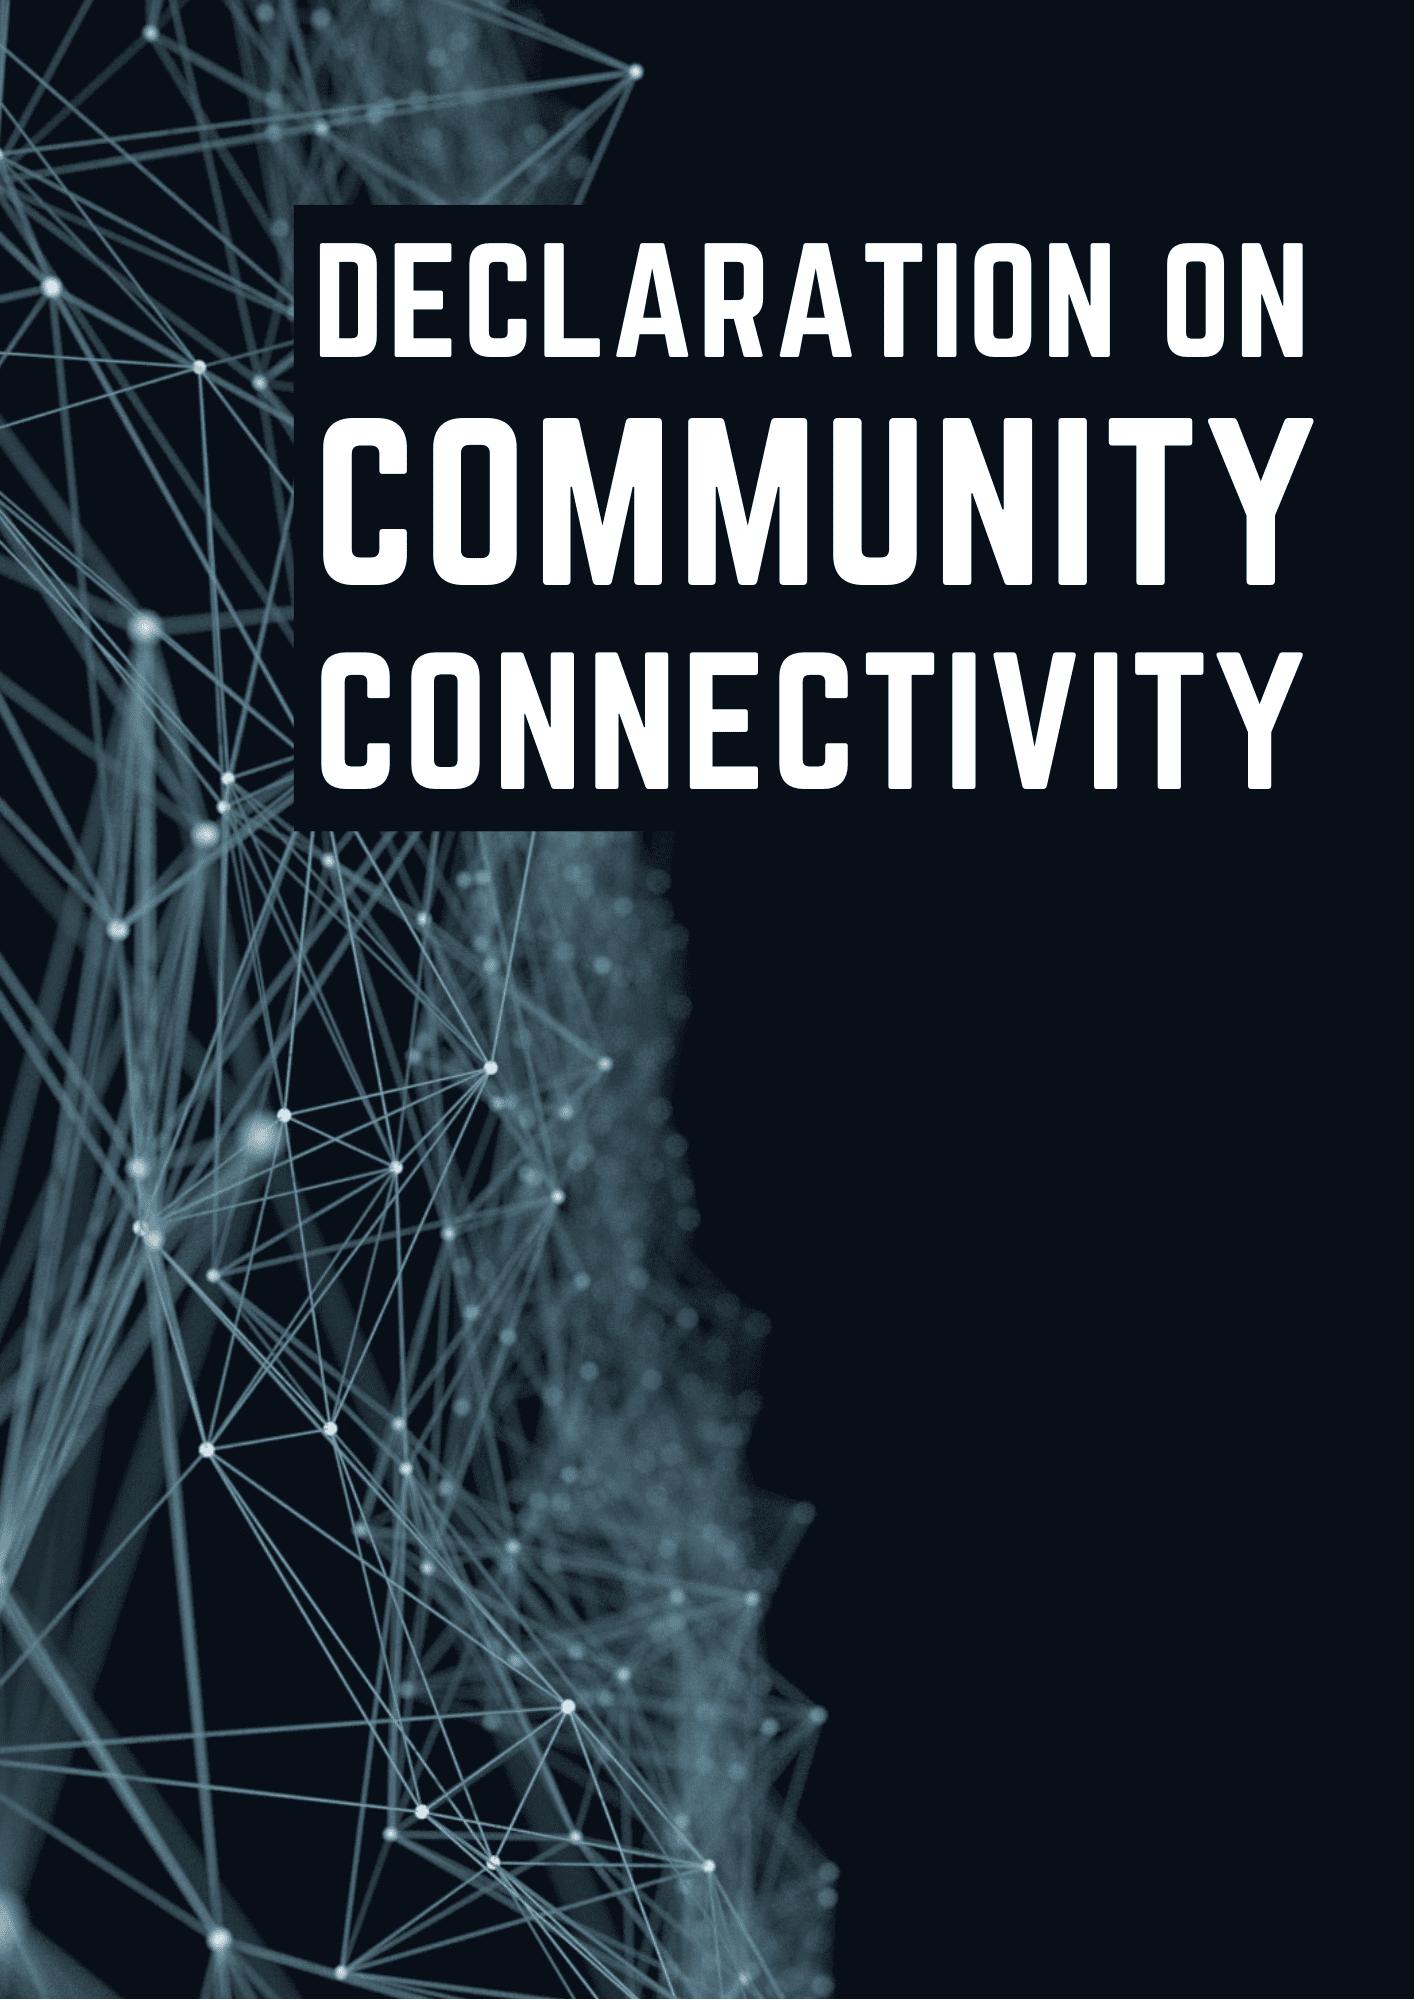 Declaration on community connectivity | Dynamic Coalition on Community Connectivity